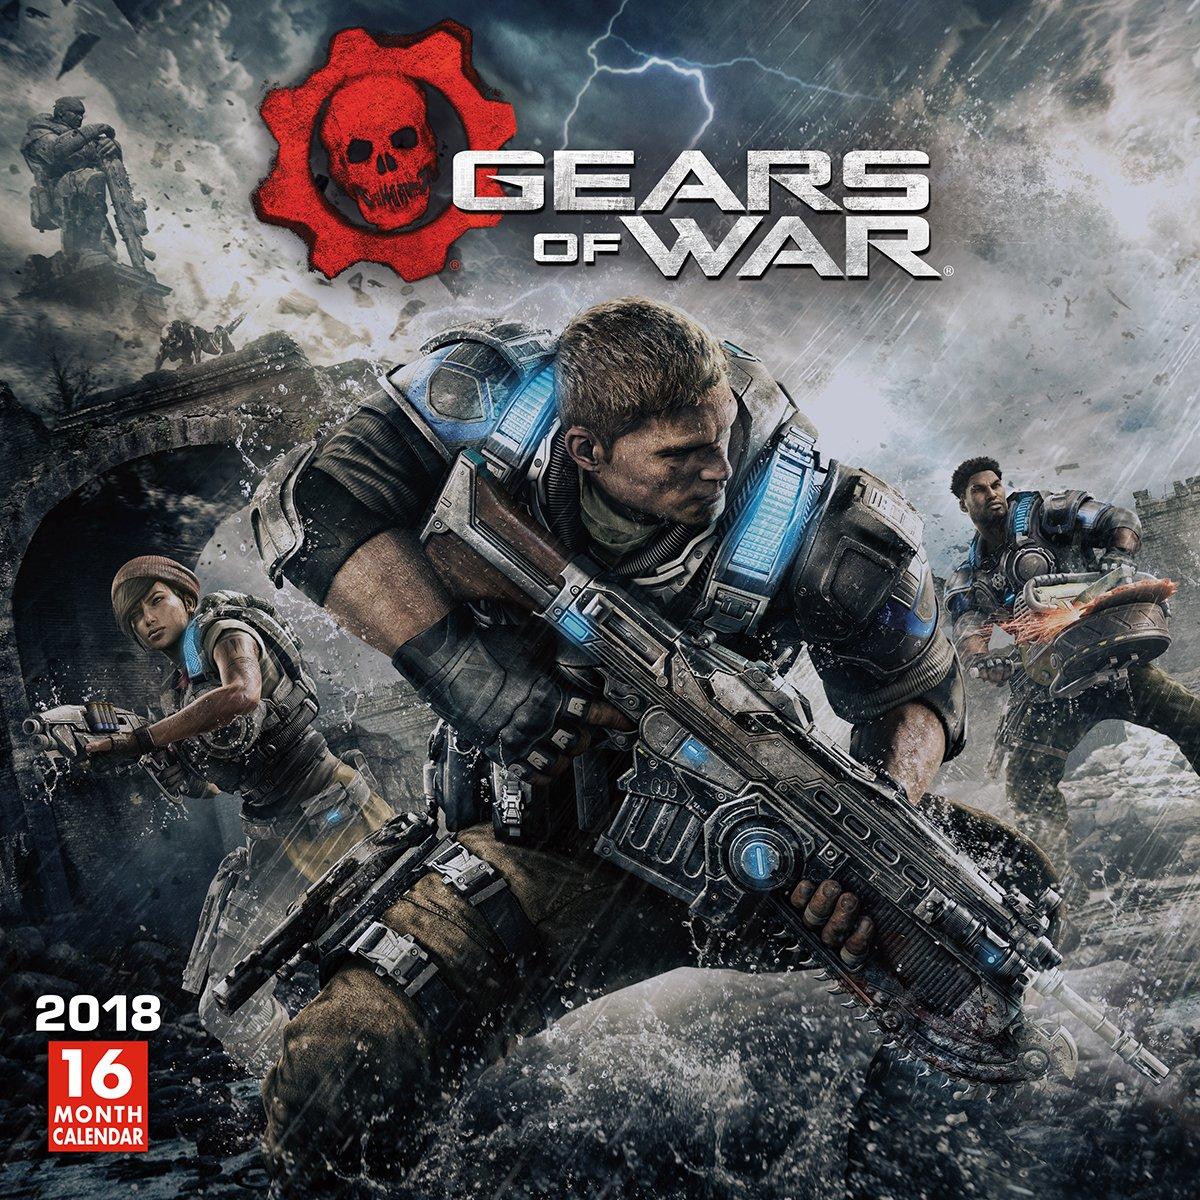 Gears Of War 2018 Wall Calendar (CA0186) pdf